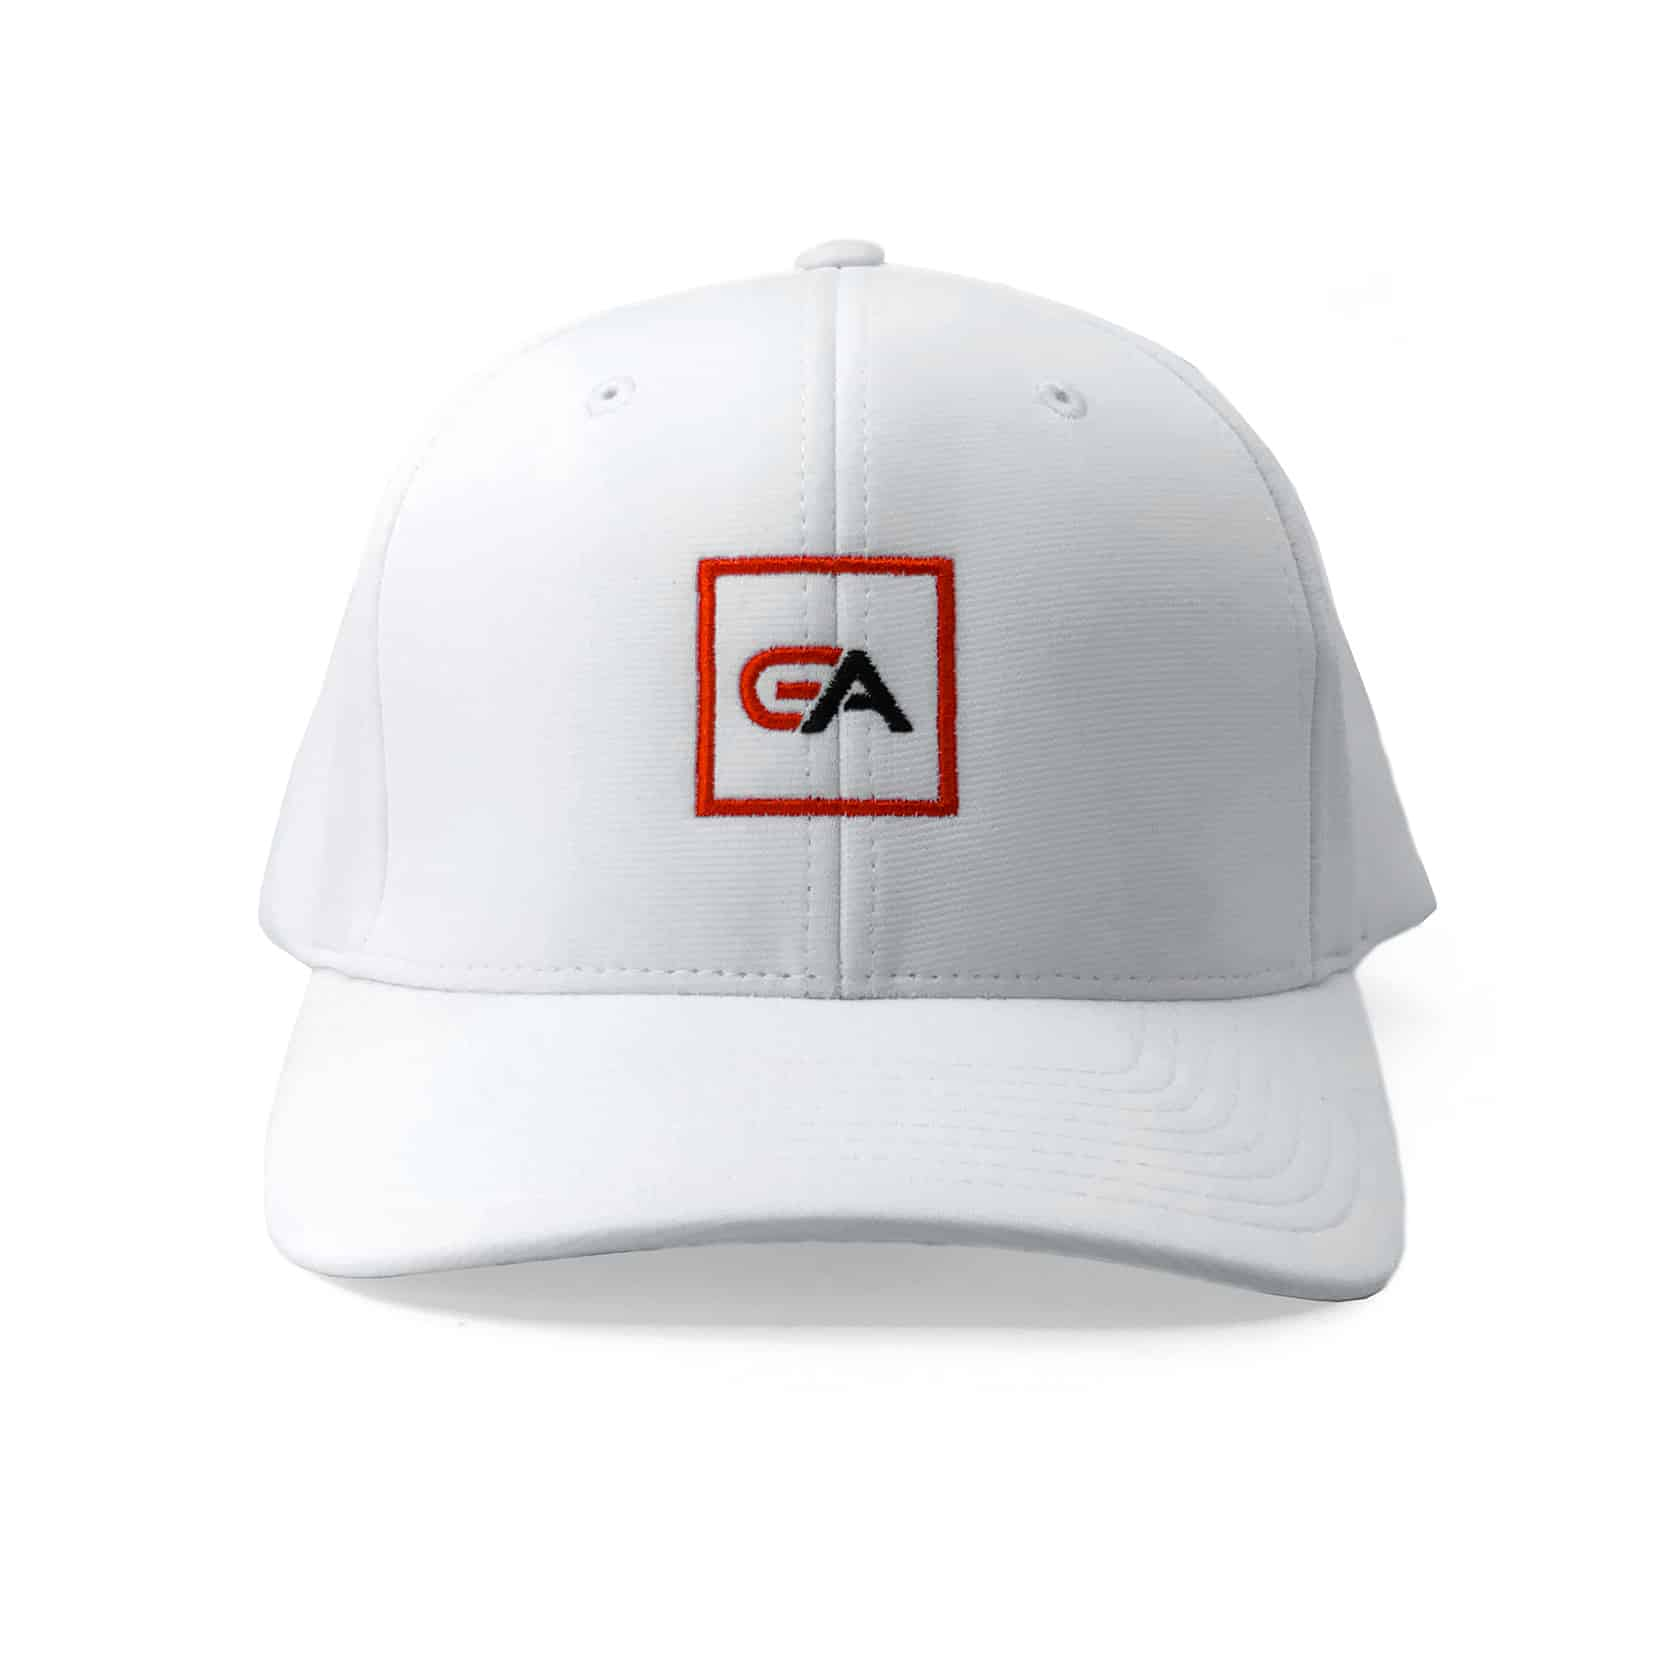 ga2 1 1 1